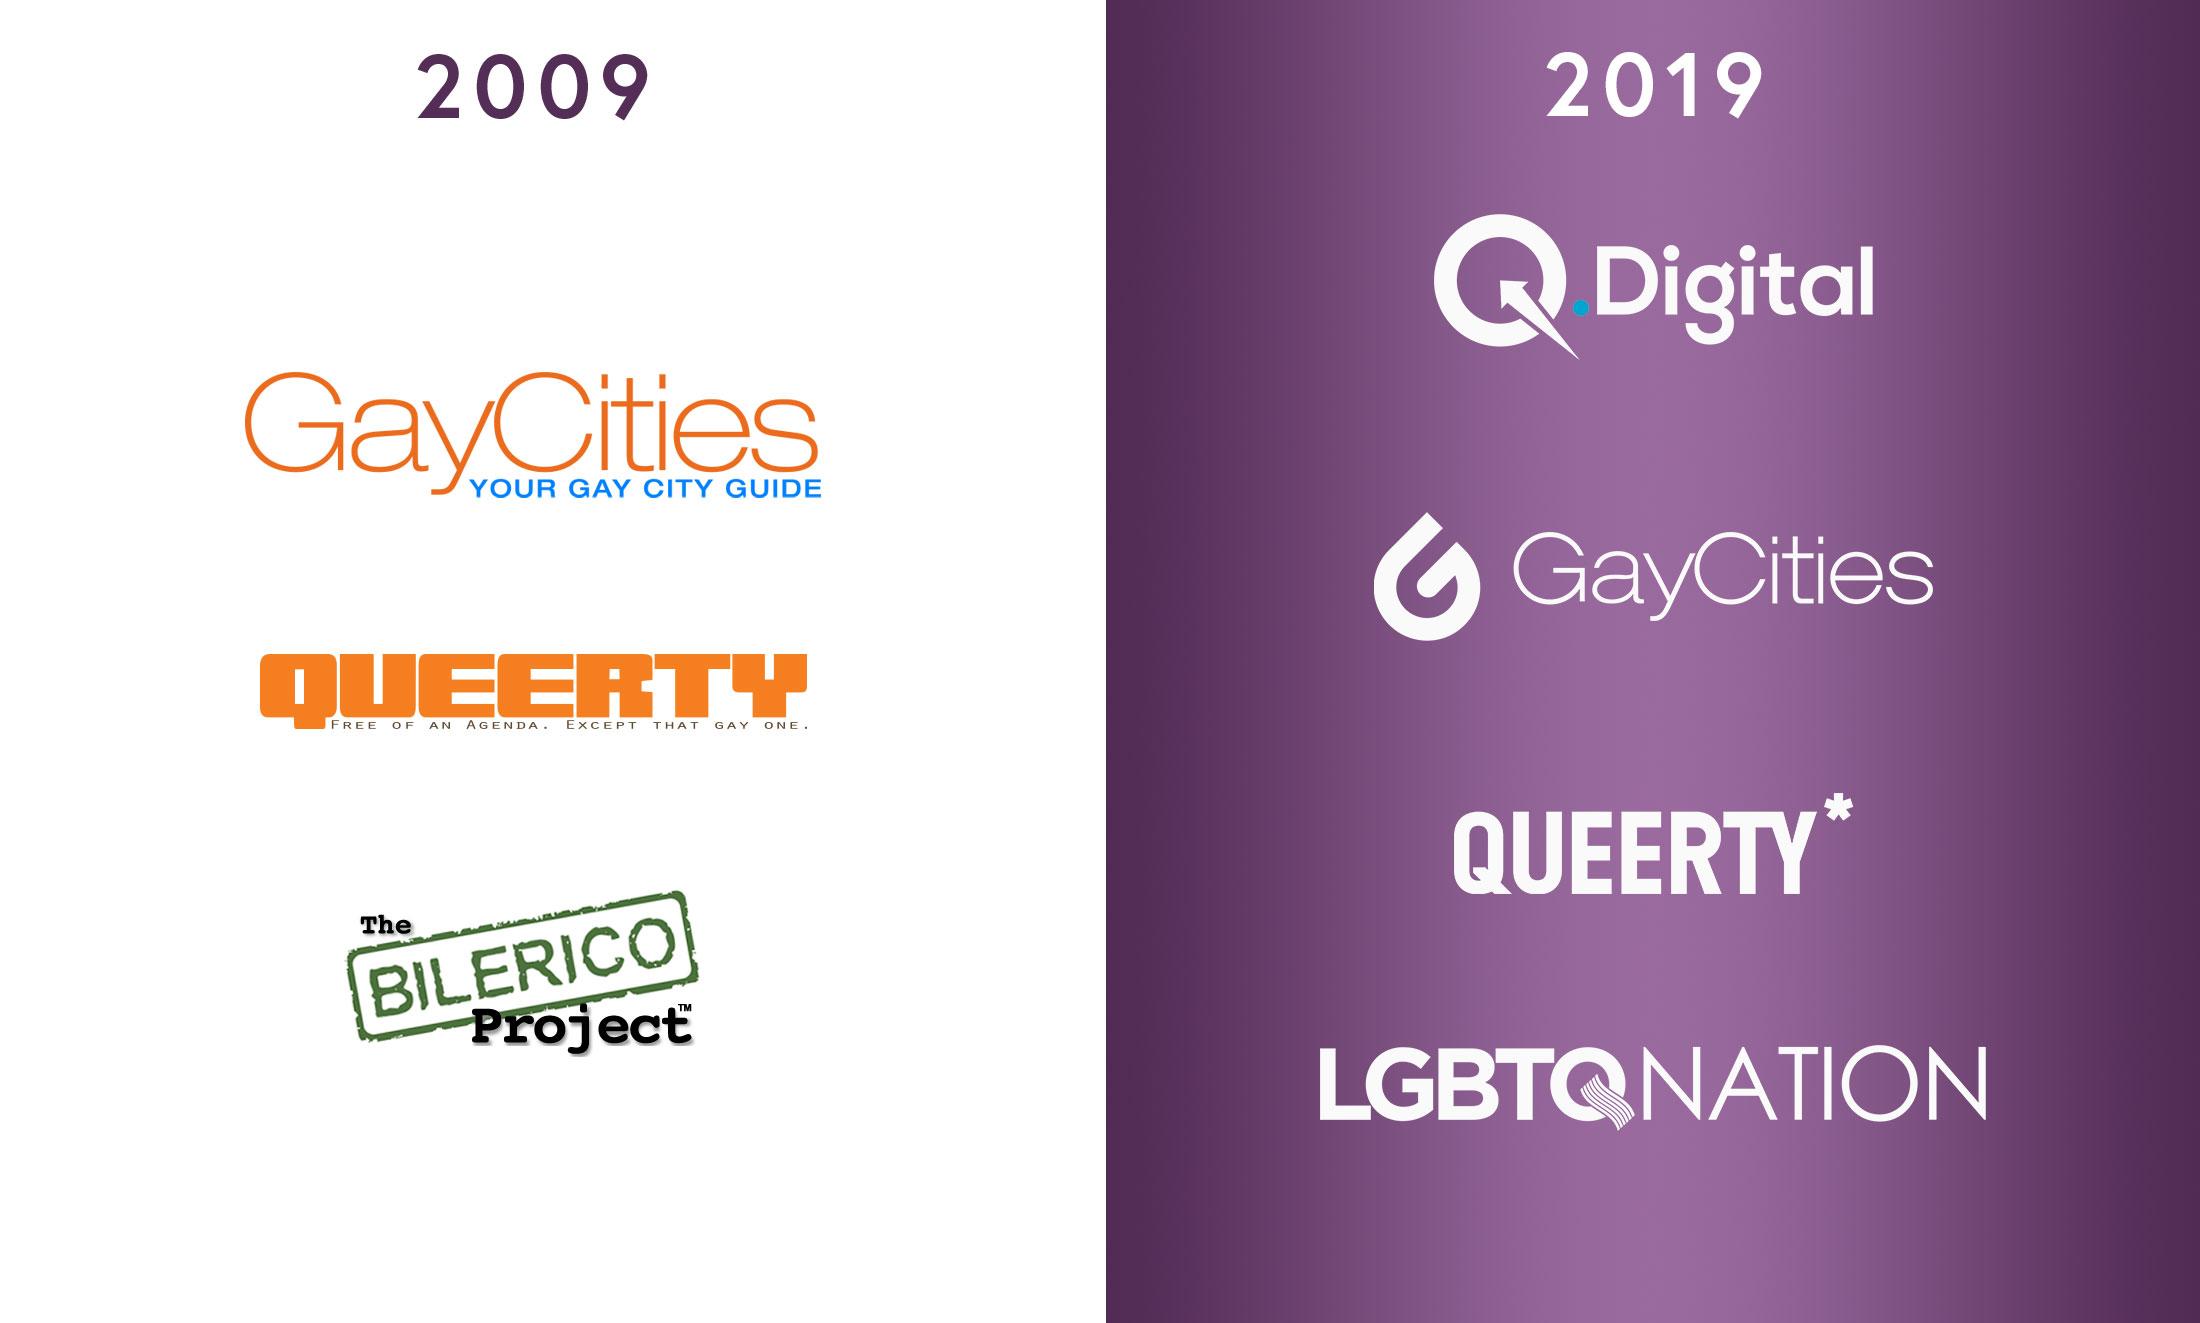 Q.Digital logos